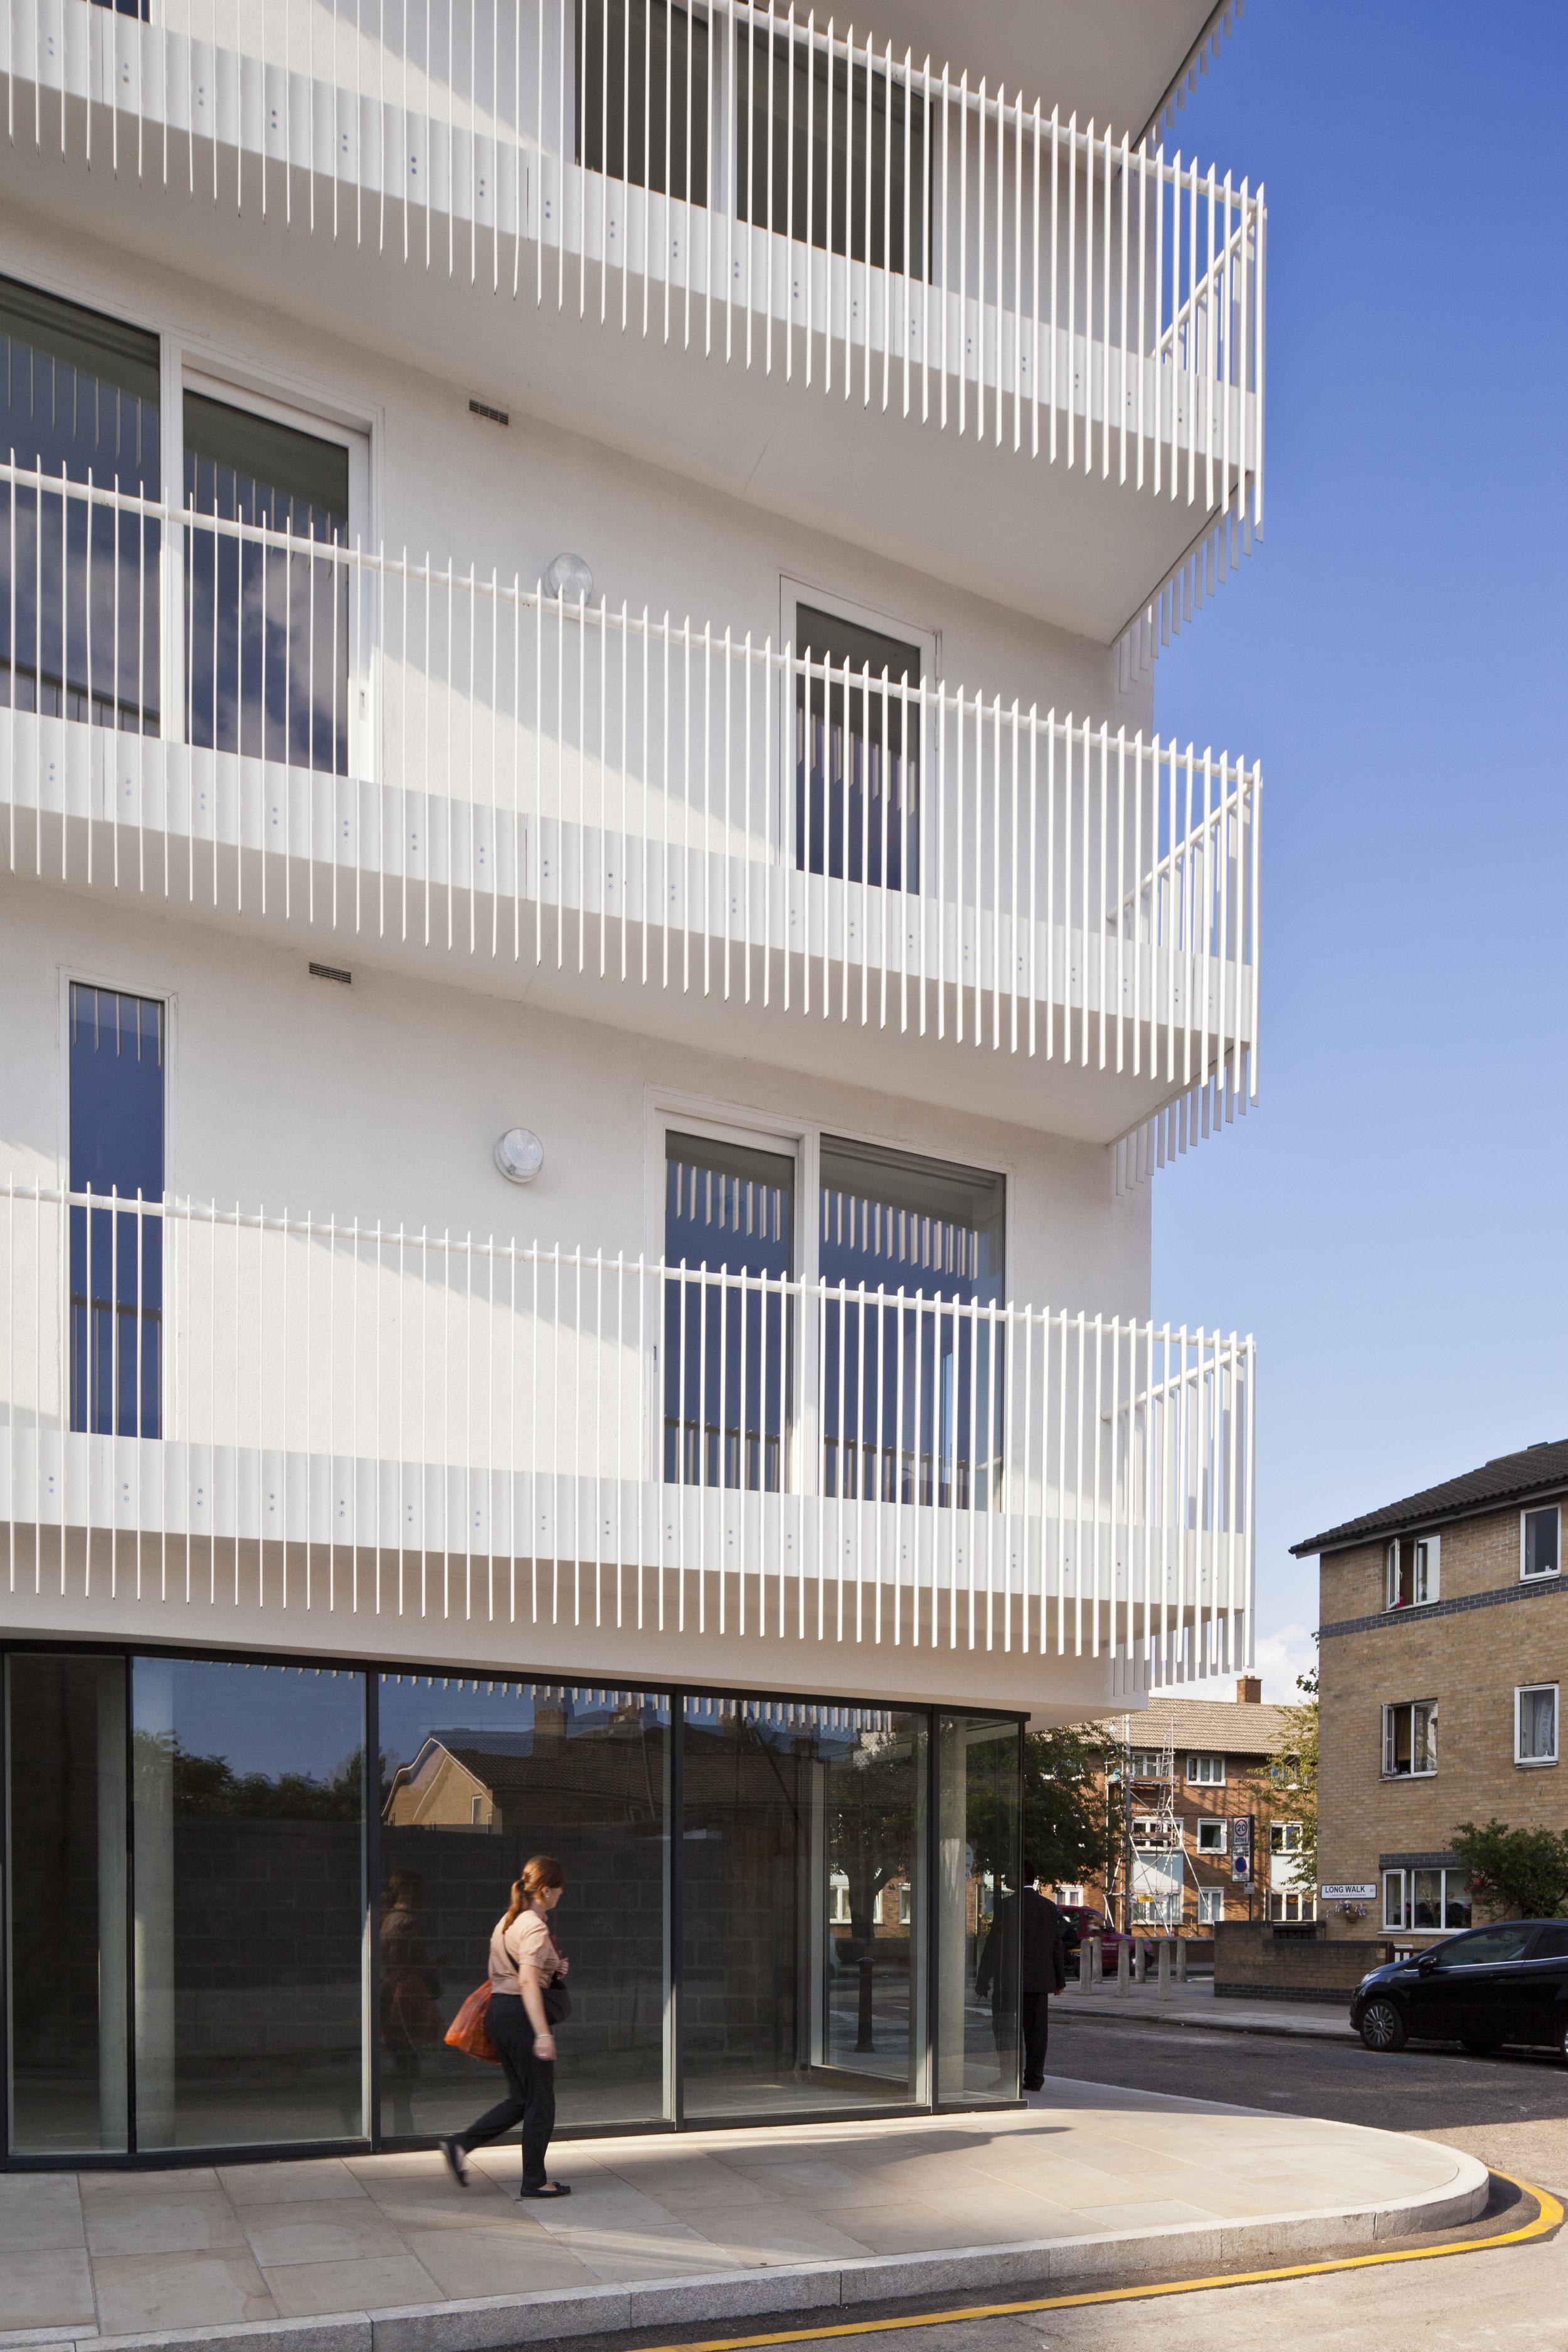 Street Level of Housing Development for Igloo Regeneration and Hexagon Housing in Bermondsey